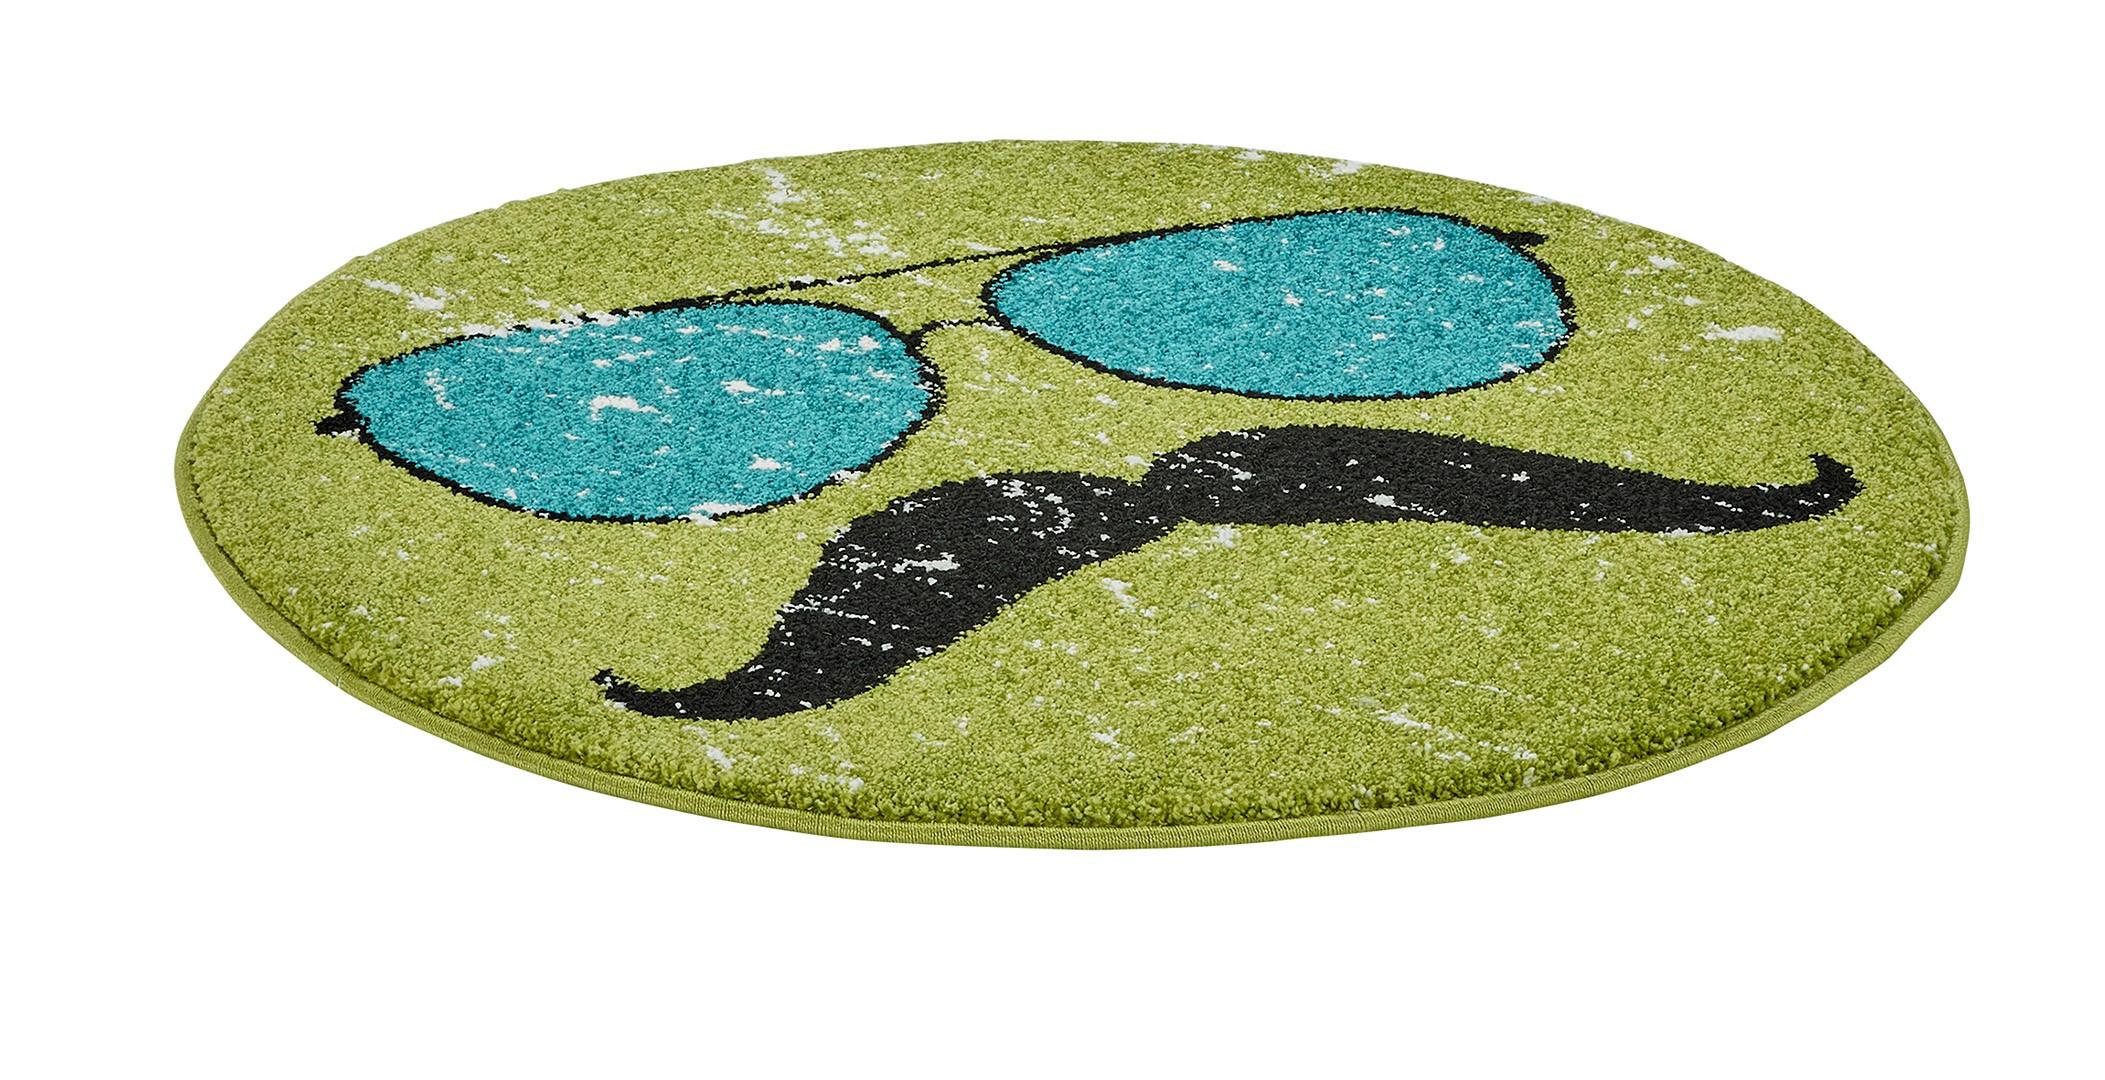 petit tapis rond vert tendance hipster. Black Bedroom Furniture Sets. Home Design Ideas